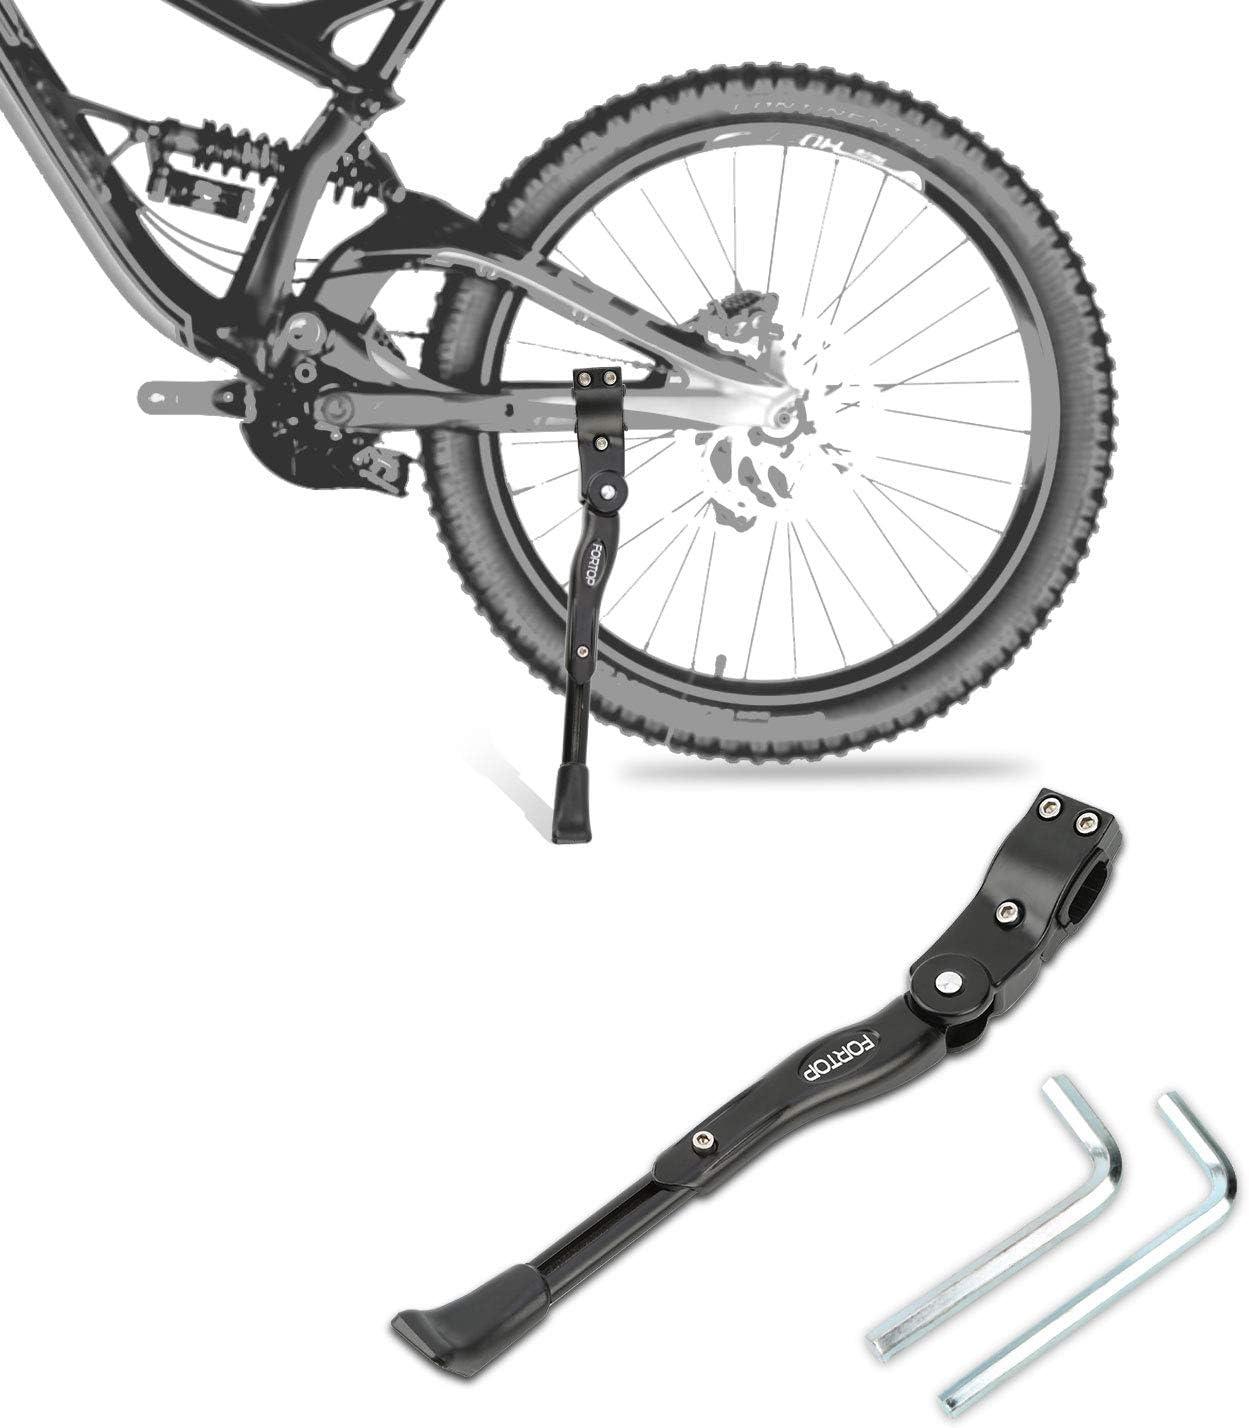 "FORTOP Bike Support Bicycle Kickstand Adjustable Aluminum Alloy for 22"" 24"" 26"" 28"" Mountain Bike/Road Bicycle/BMX/MTB/City Commuter Bike/Kids Bike/Sports Bike/Adult Bike/700 Road Bike: Home Improvement"